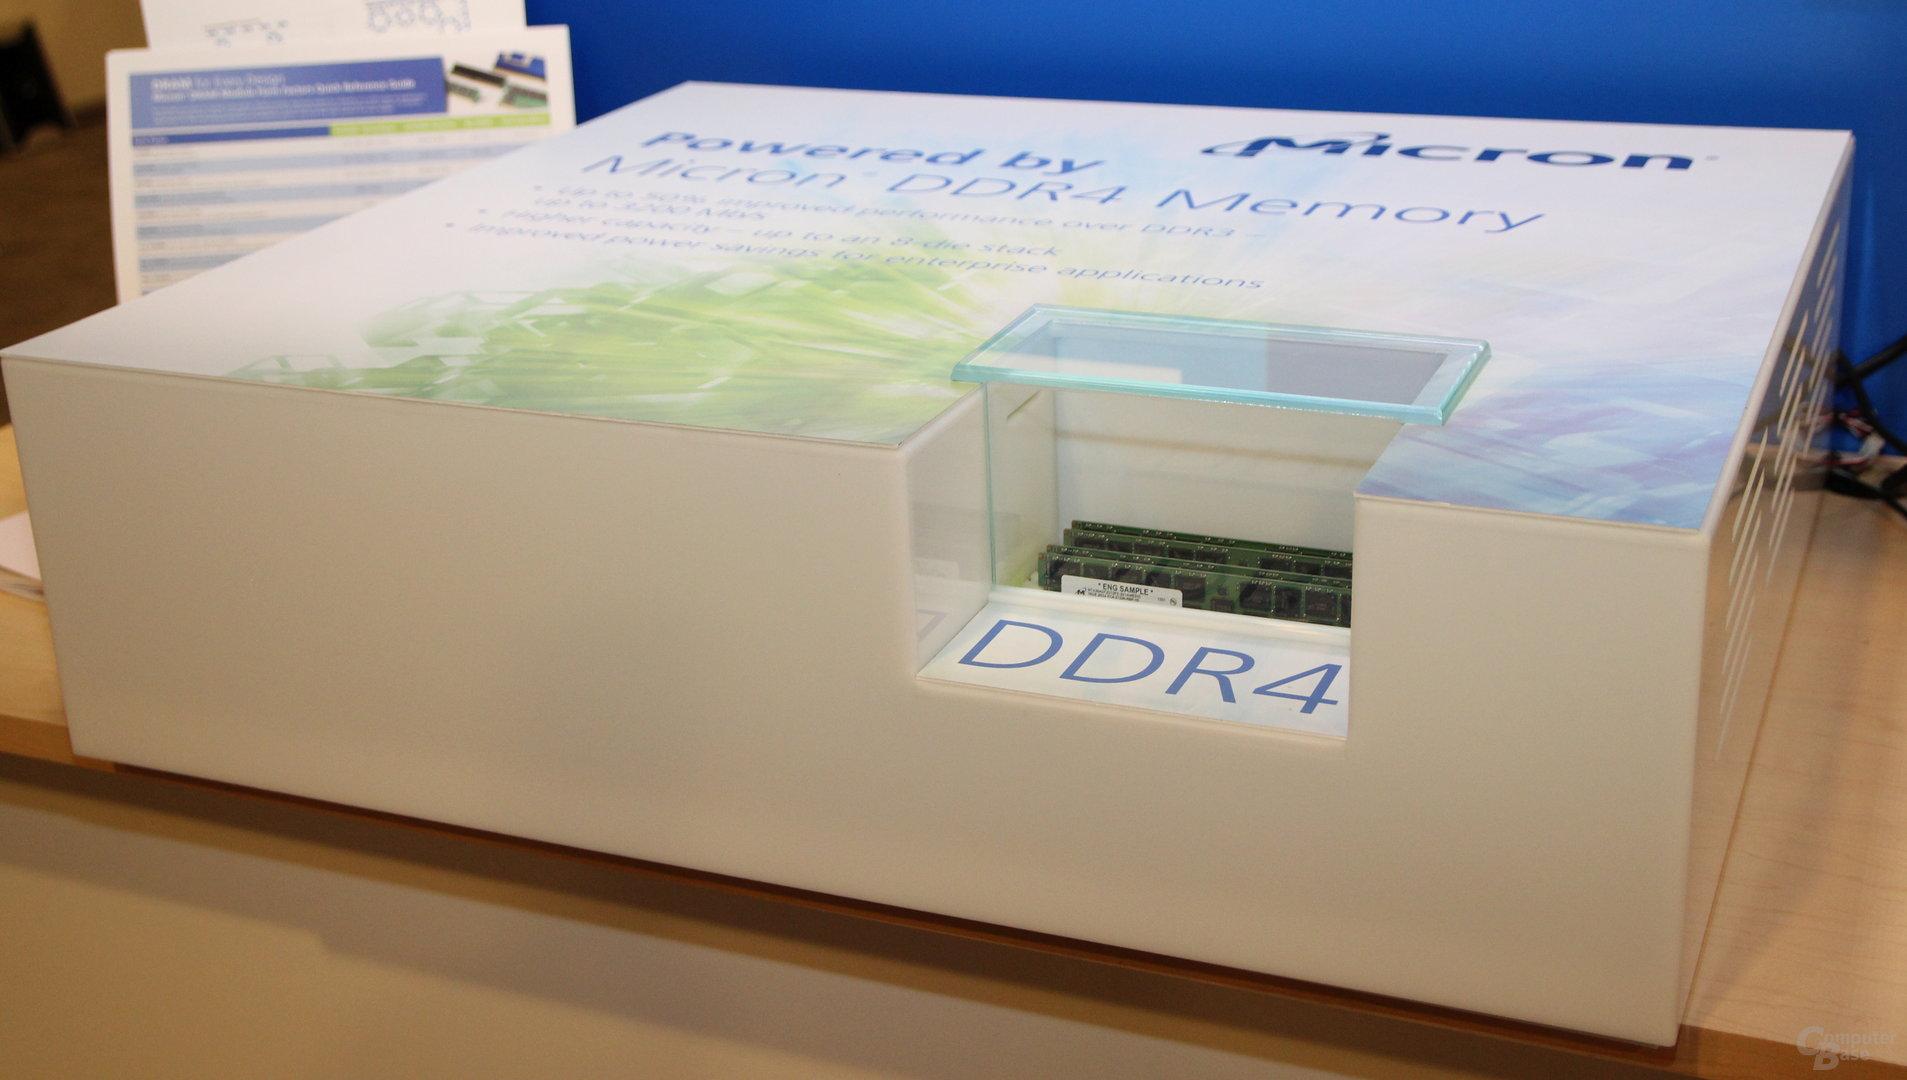 DDR4-Demo-Kit auf dem IDF 2013